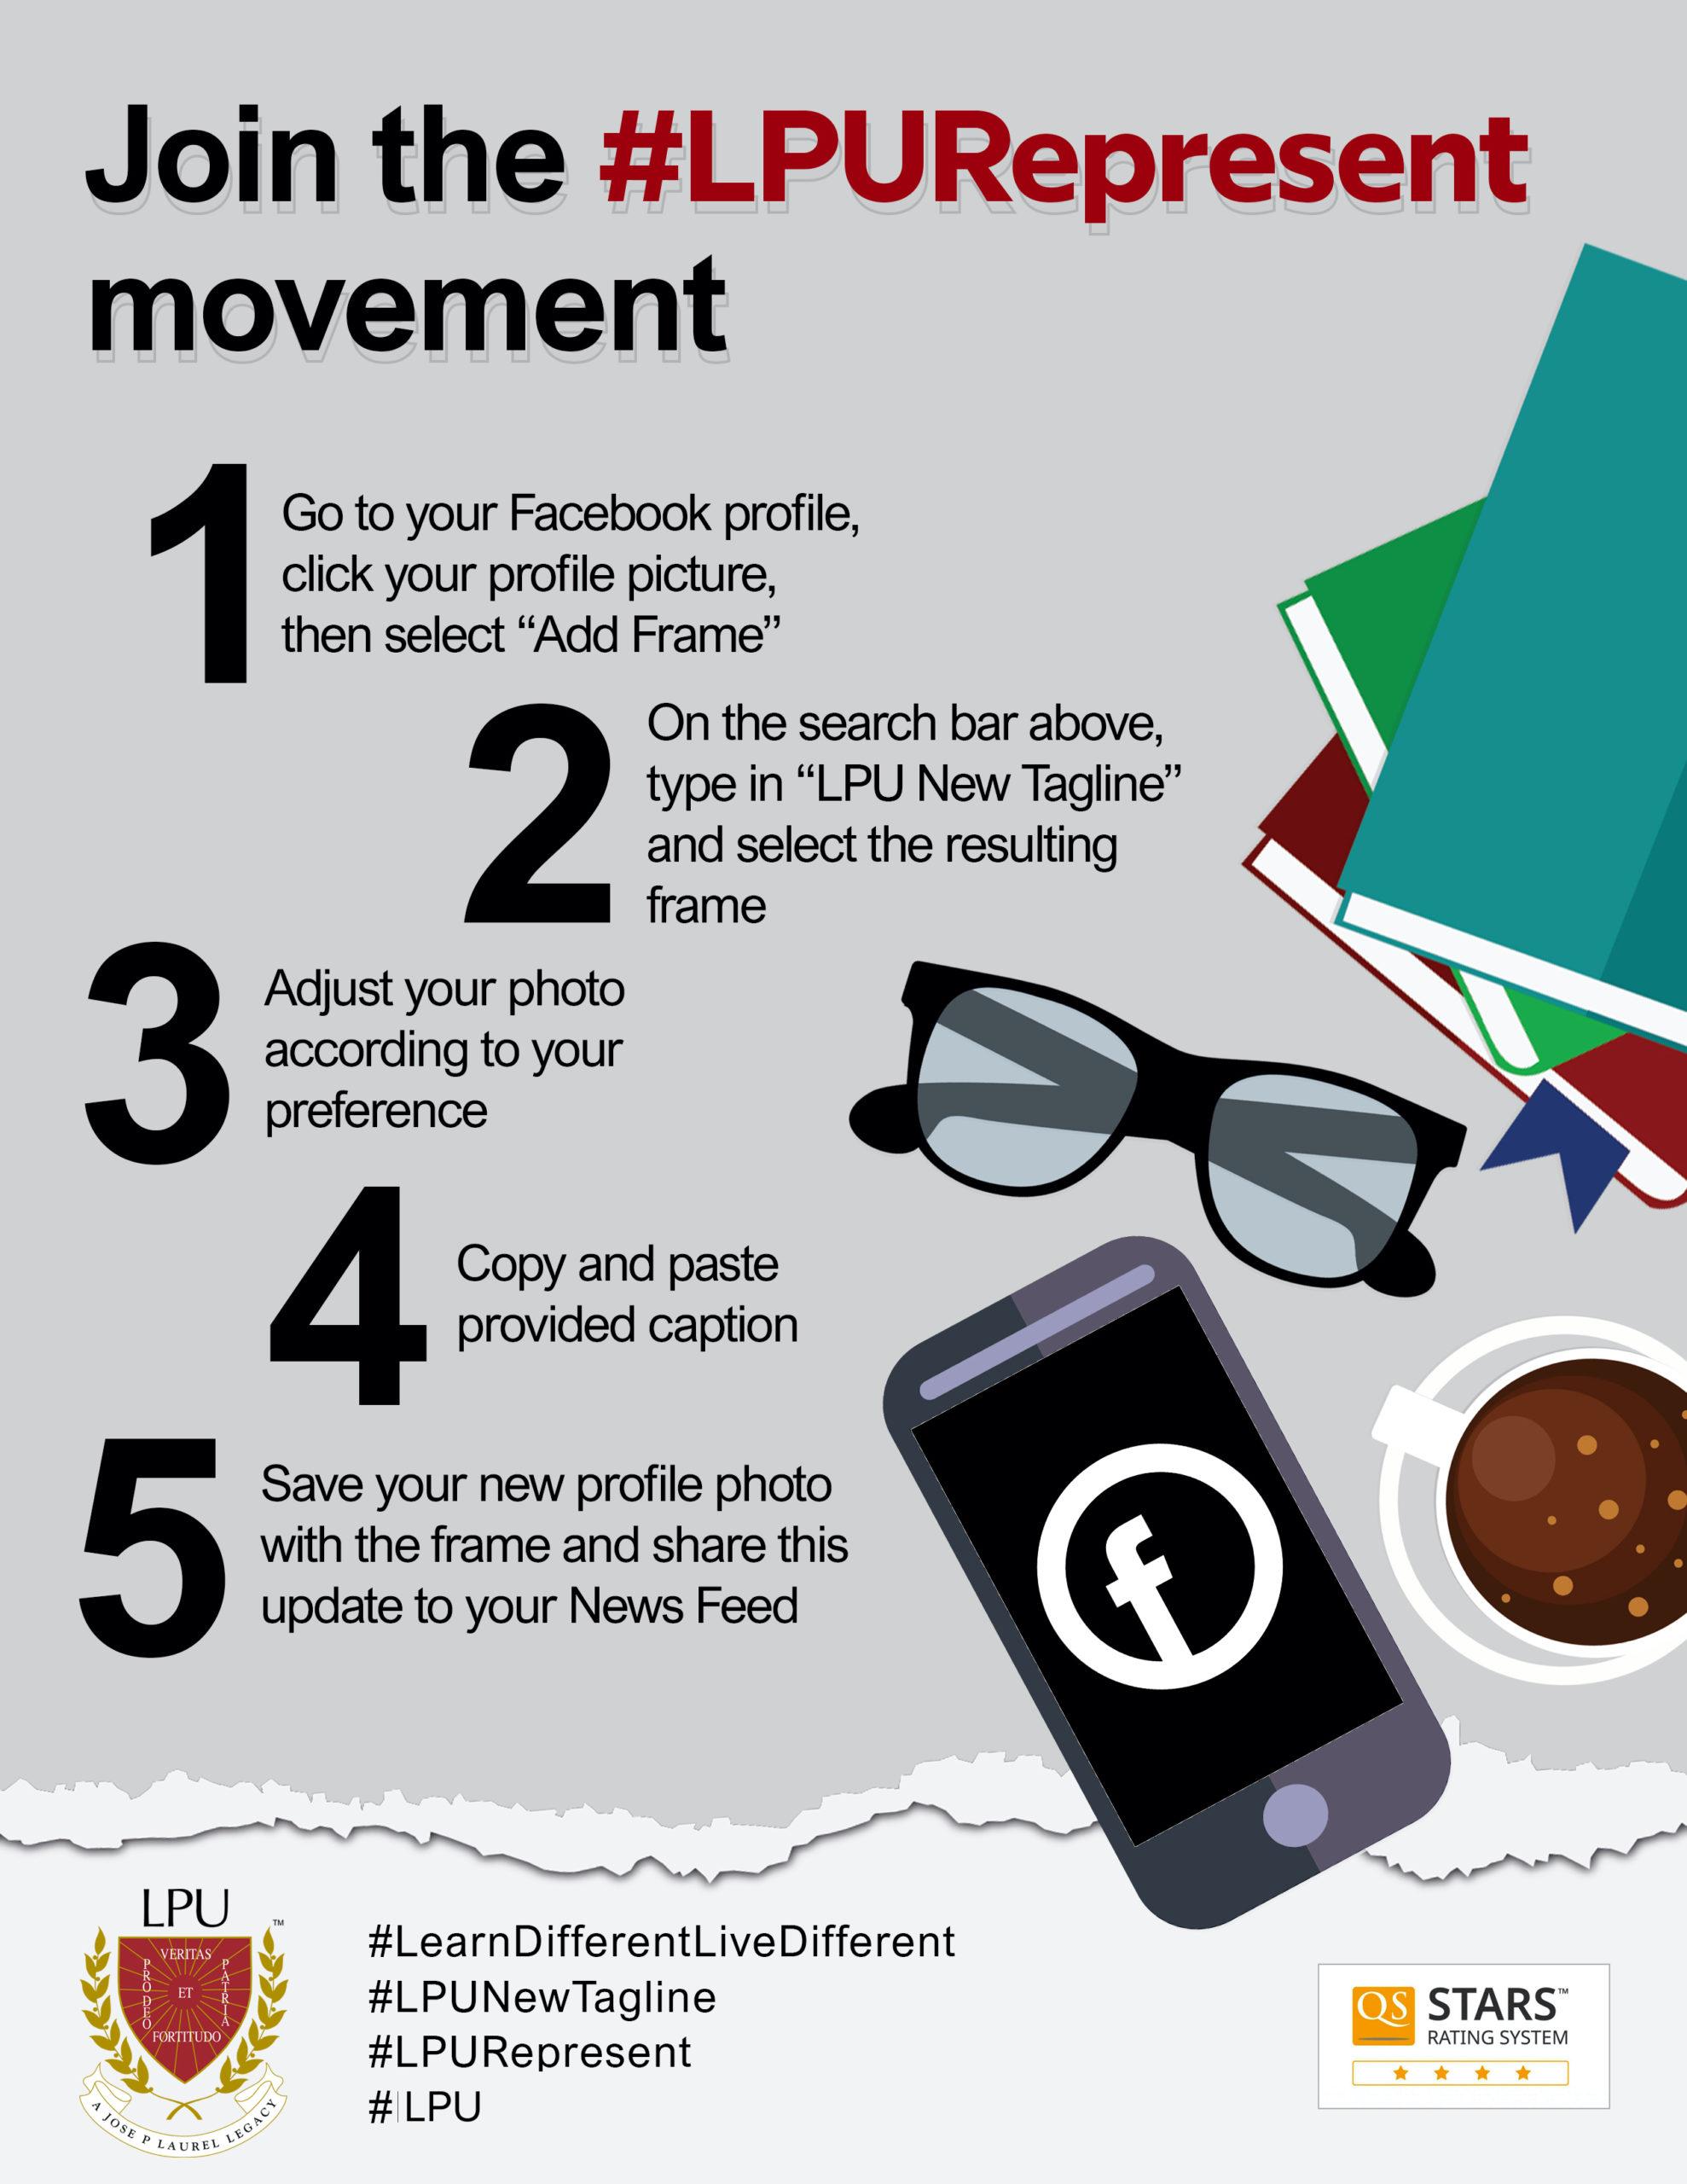 #LPURepresent Movement